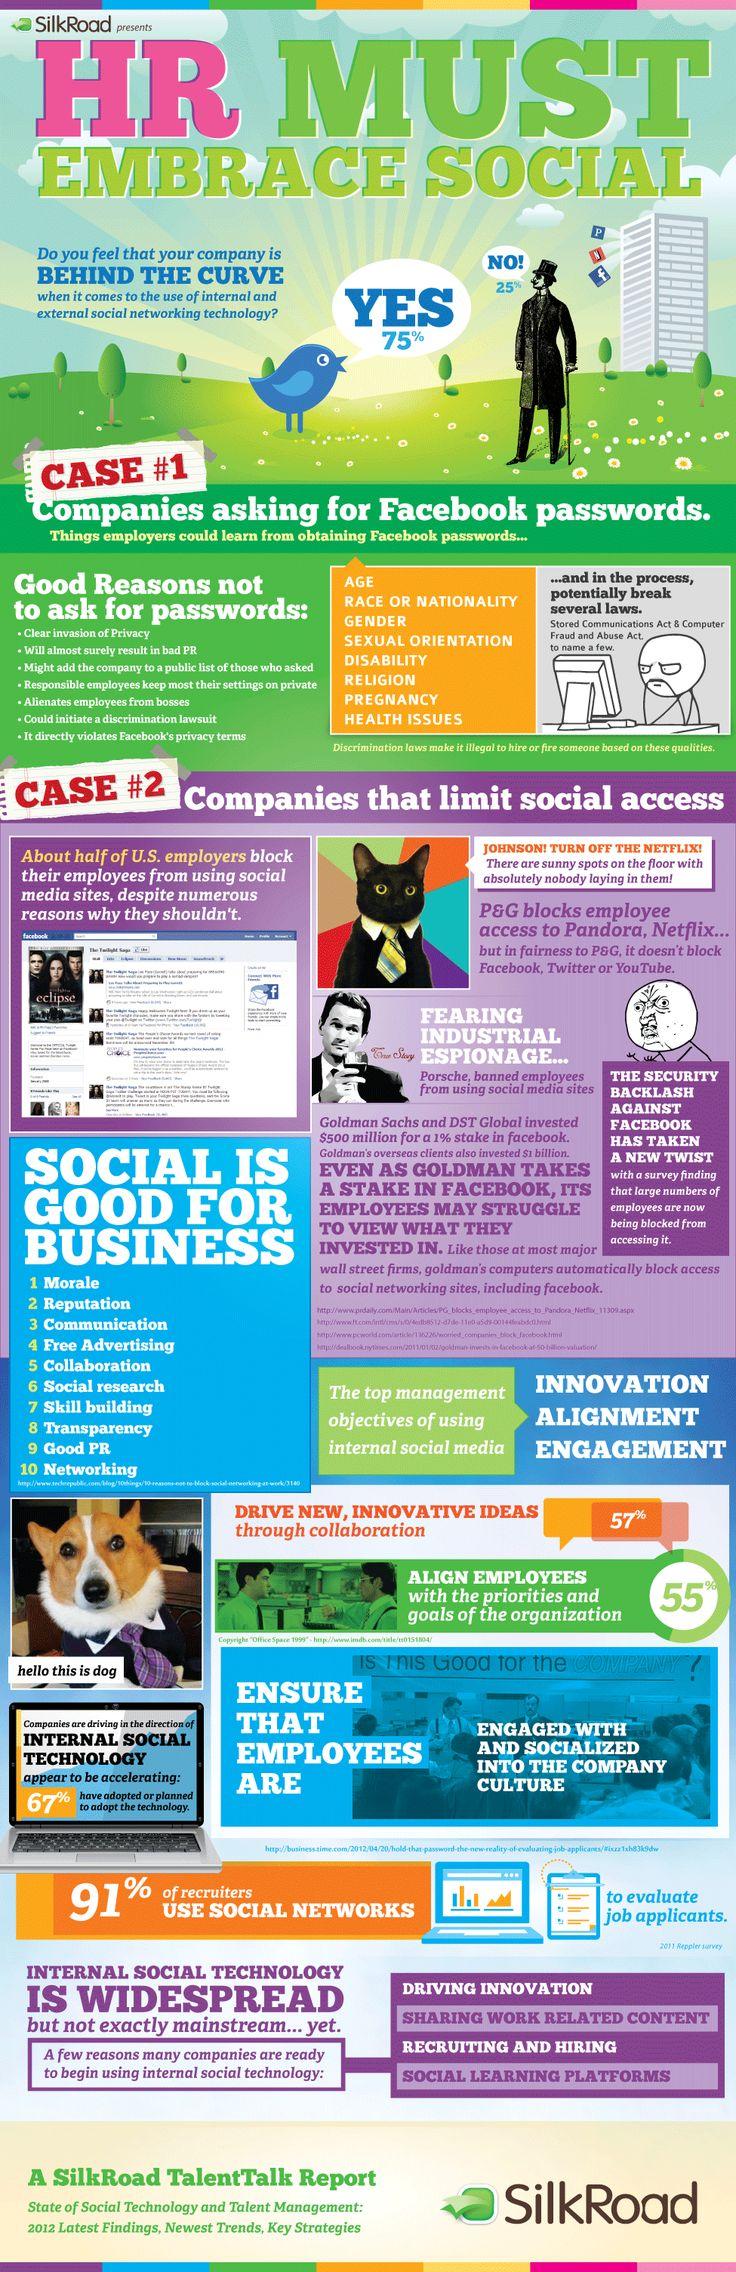 Why HR Must Embrace Social MediaWork, Human Resources, Social Media, Talent Management, Media Infographic, Personalized Softskills, Embrace Social, Socialmedia, Medium